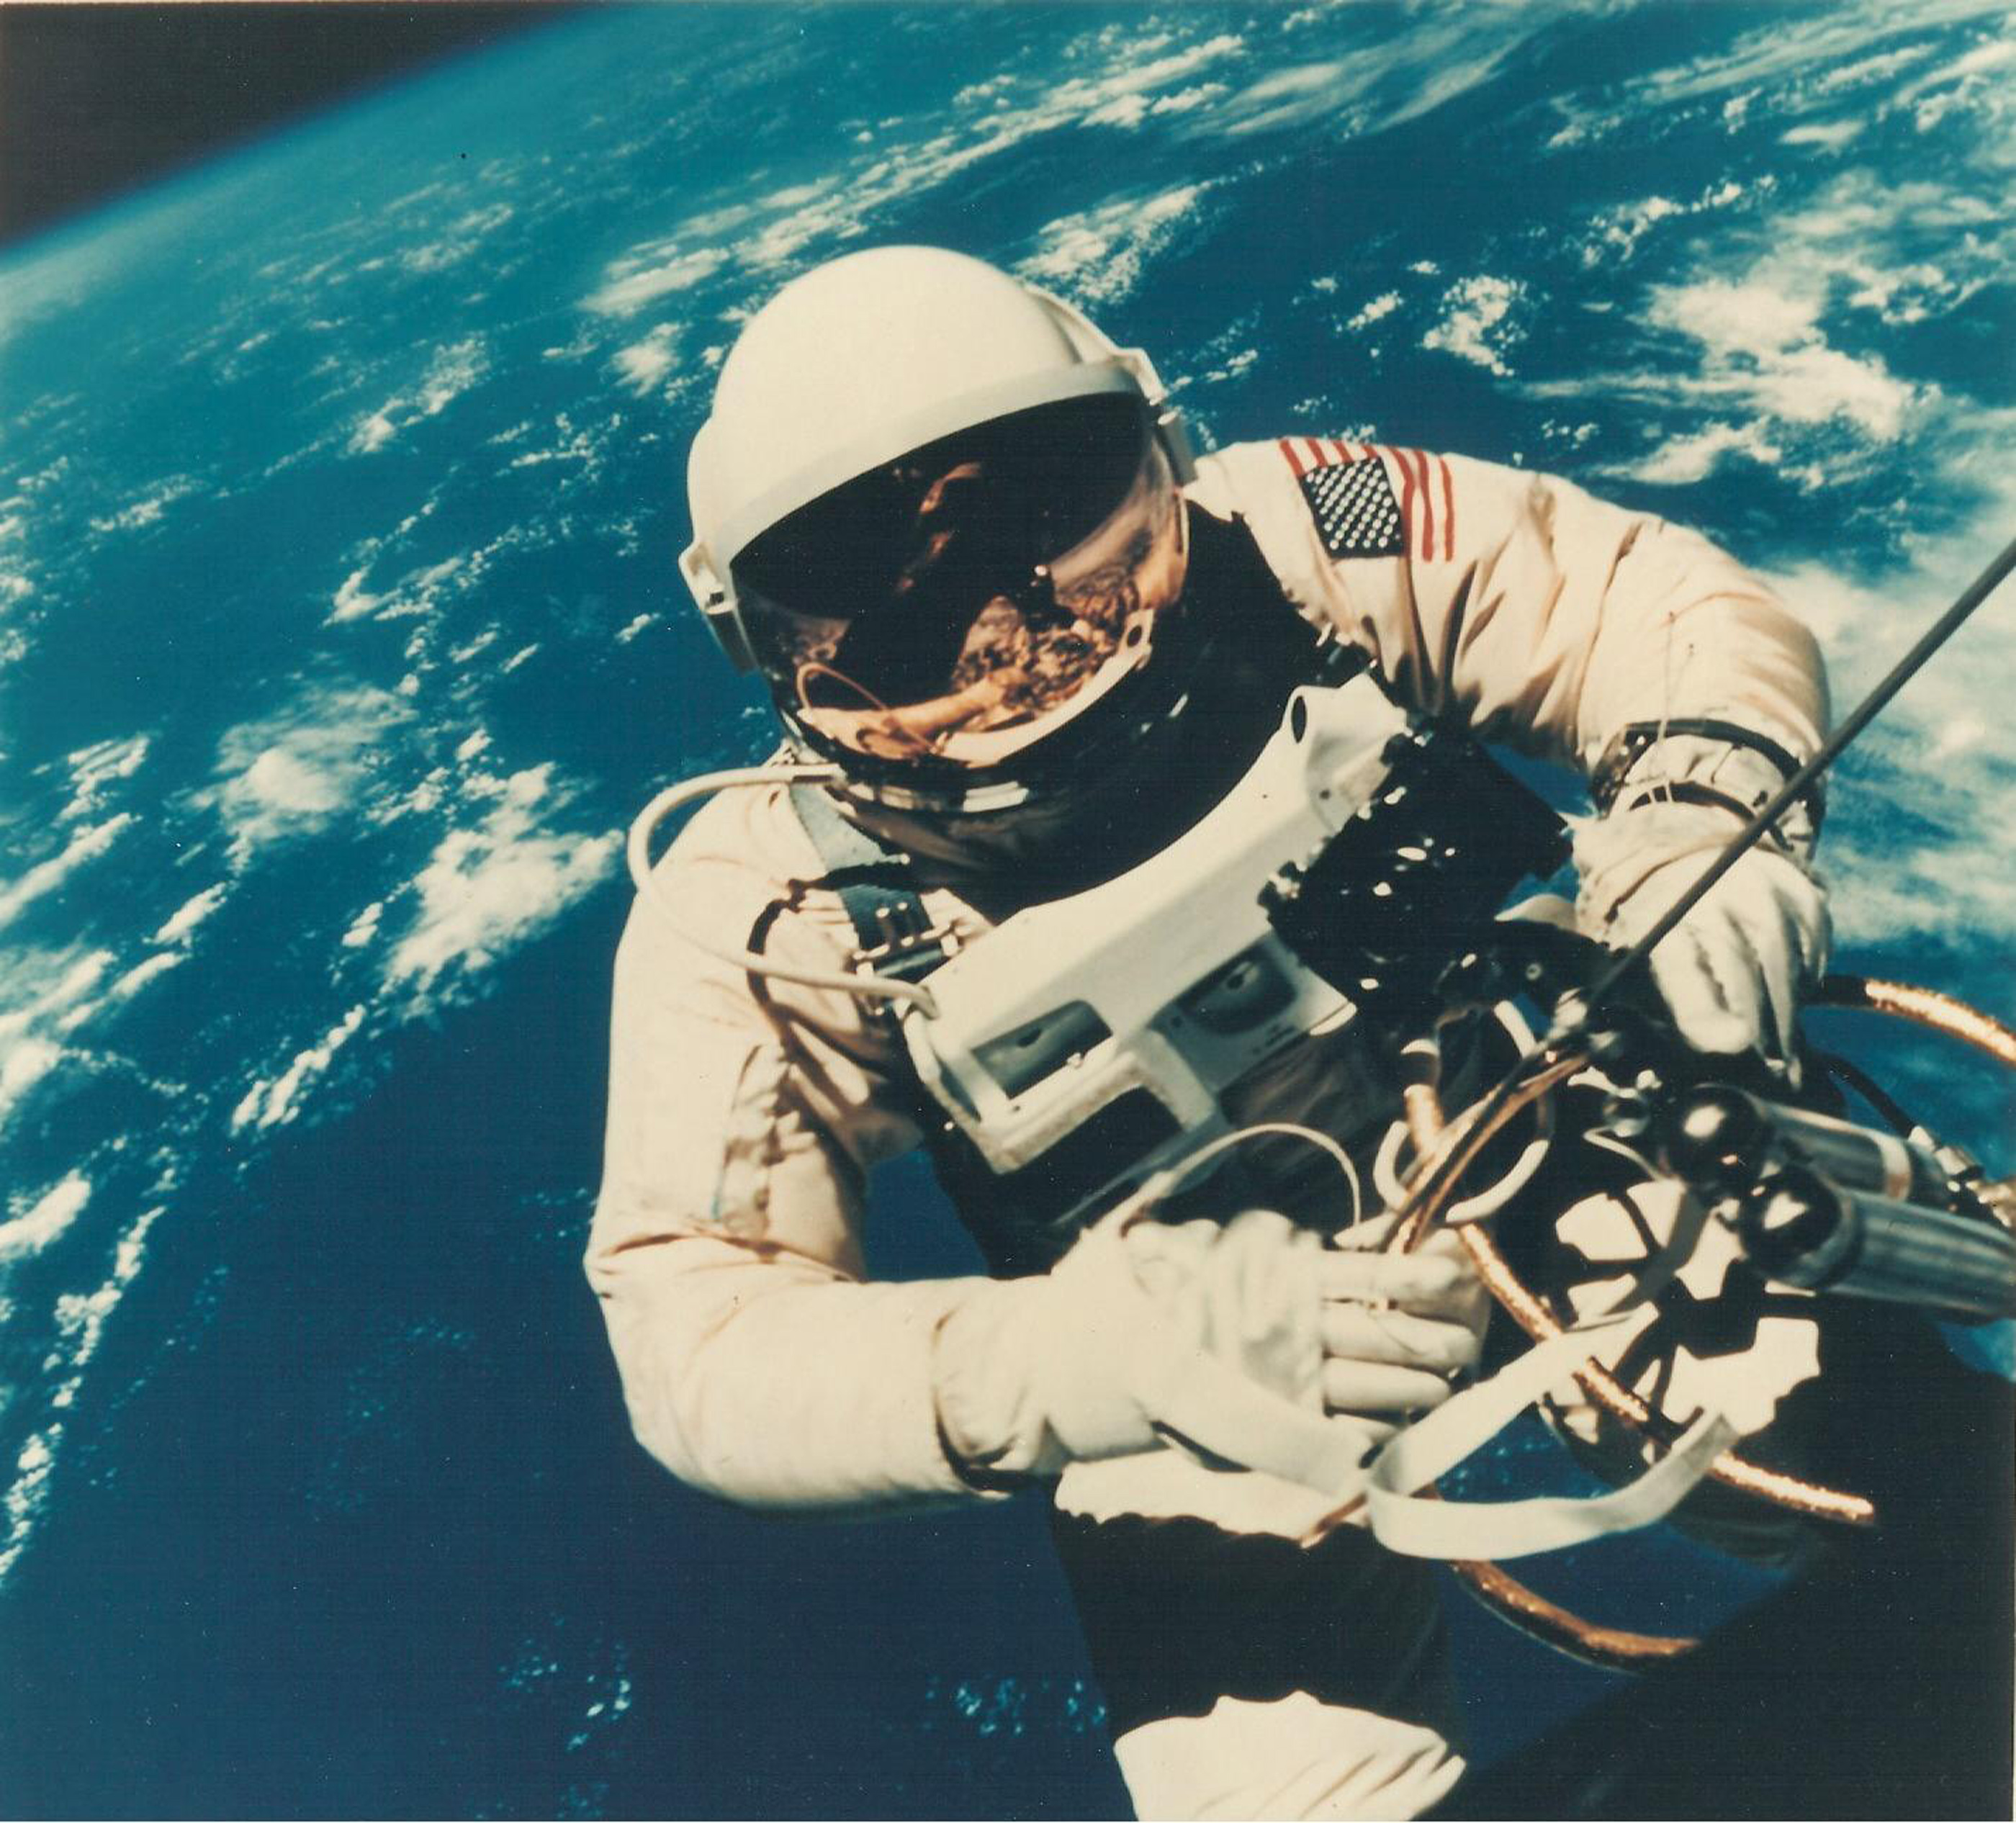 Astronaut Edward H. White II's Space Walk on Gemini IV